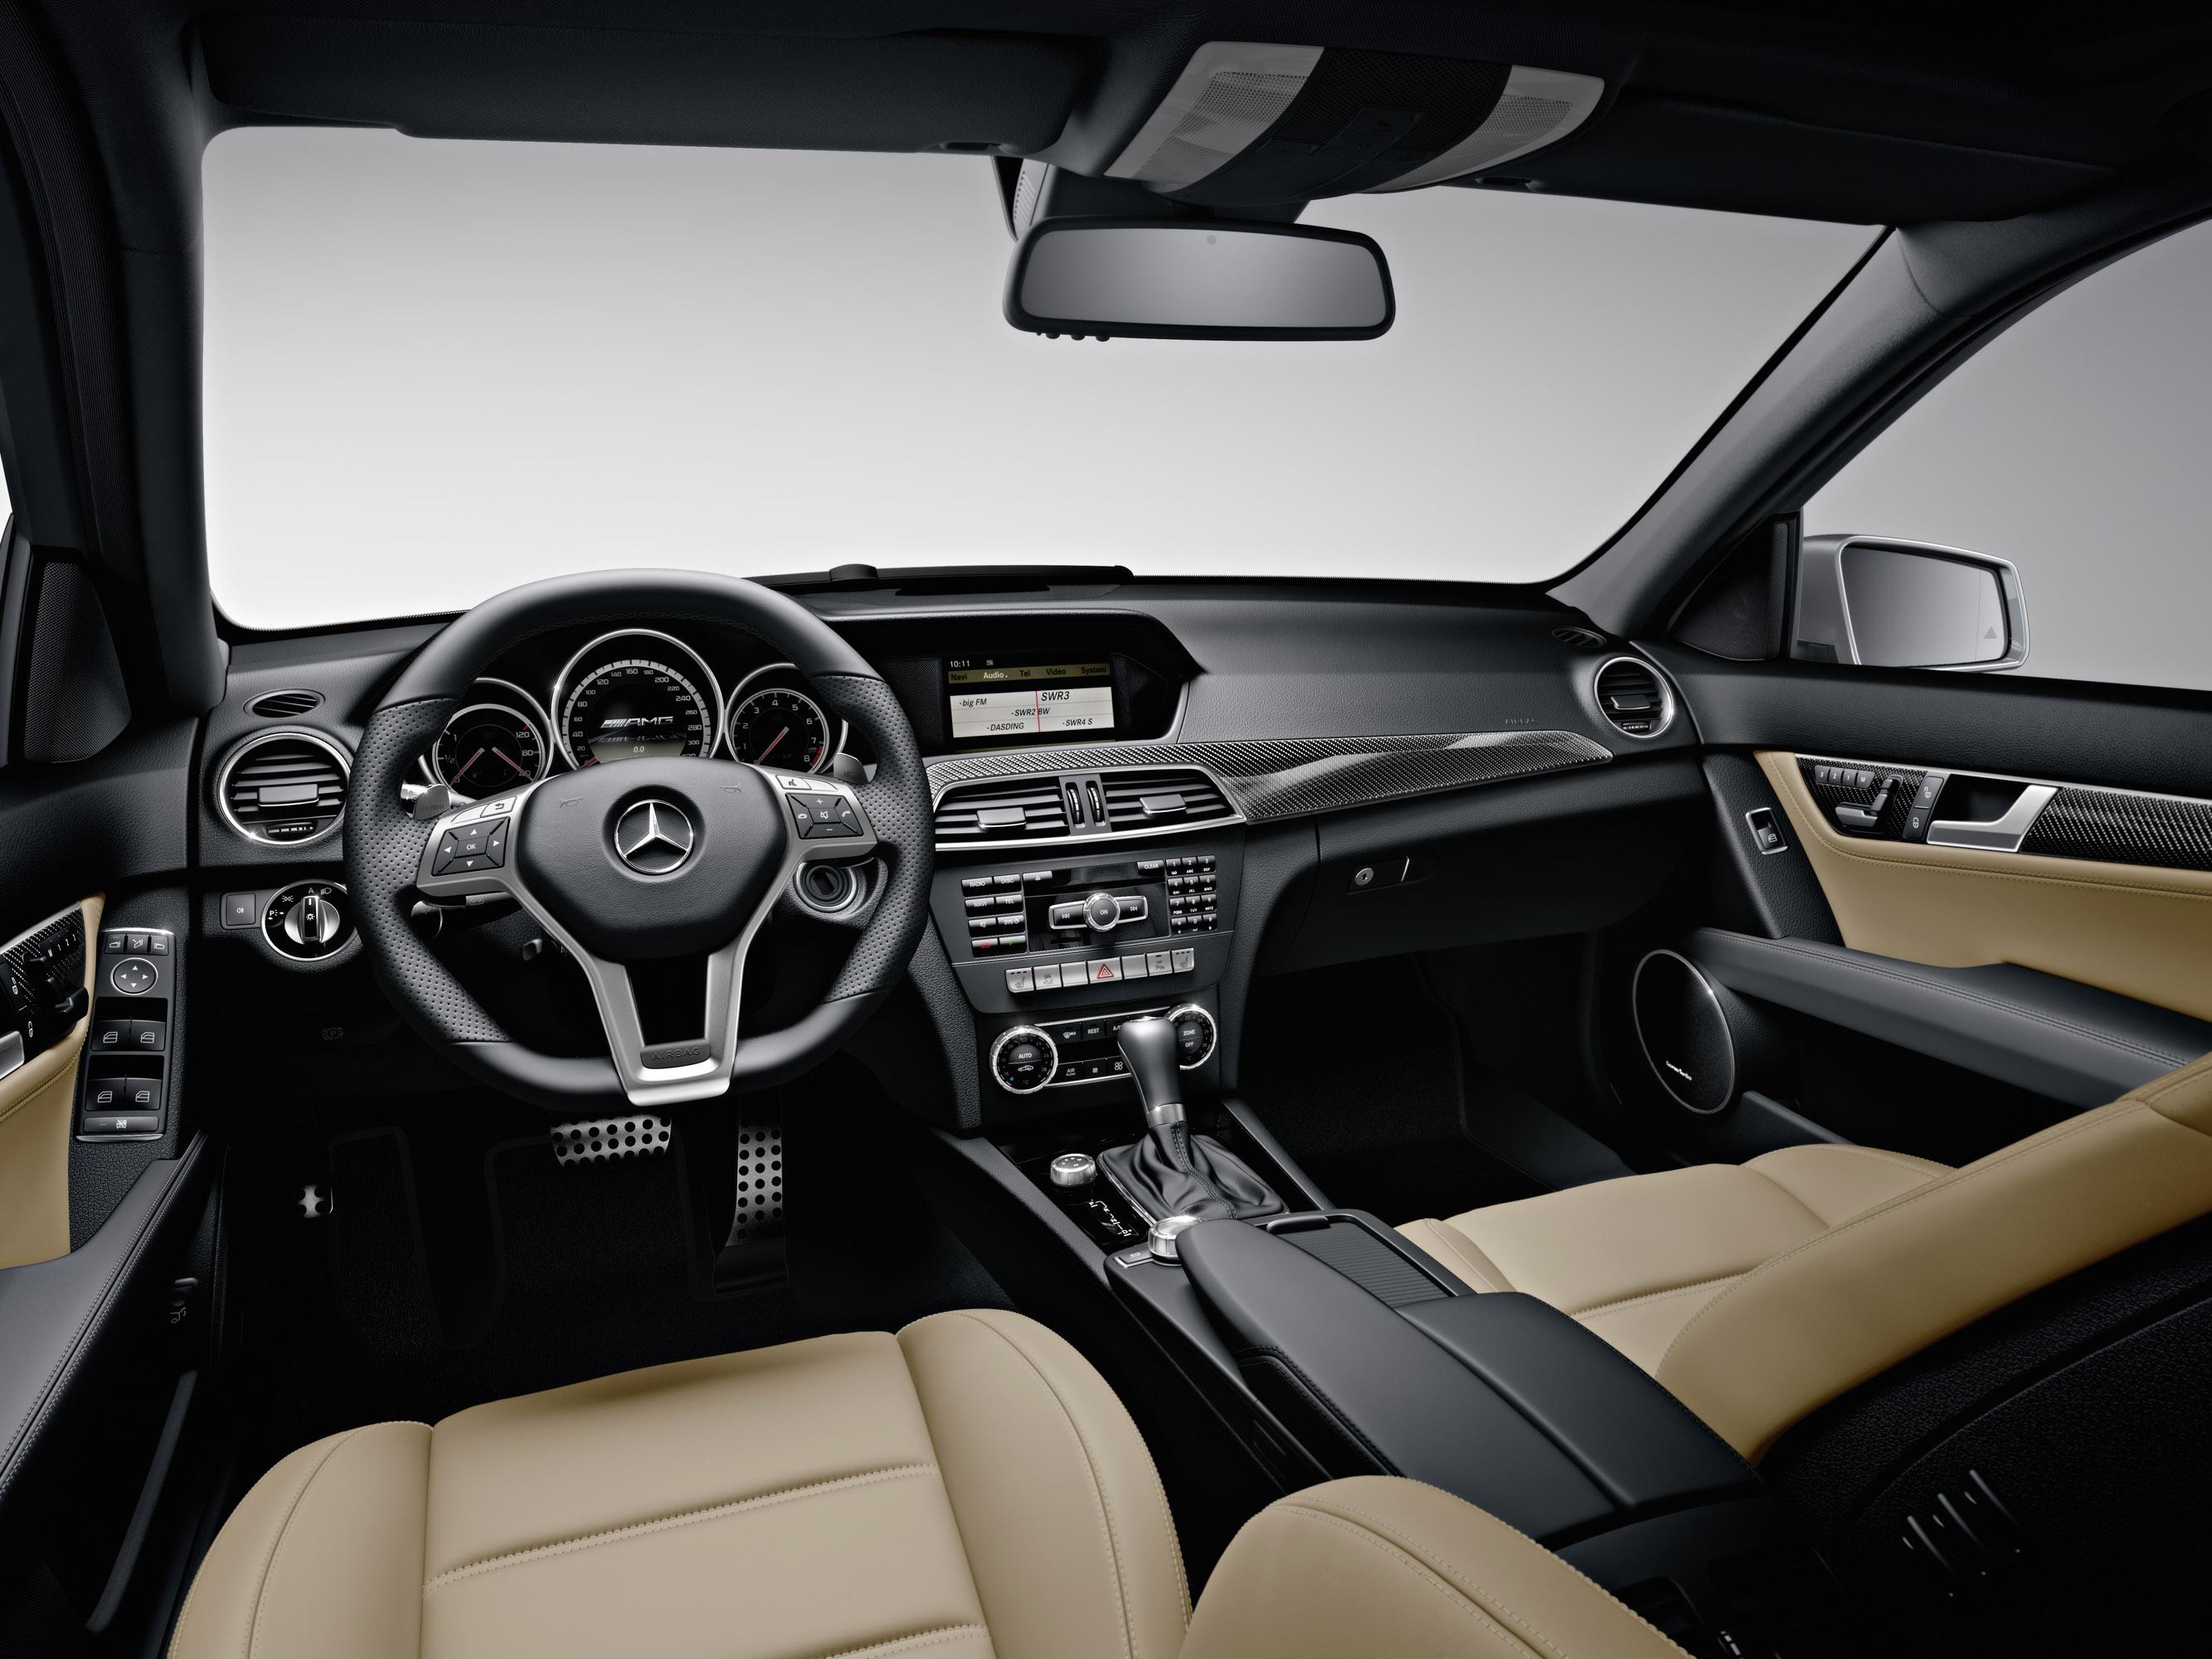 2012 Mercedes-Benz C63 AMG Estate thumbnail photo 35480